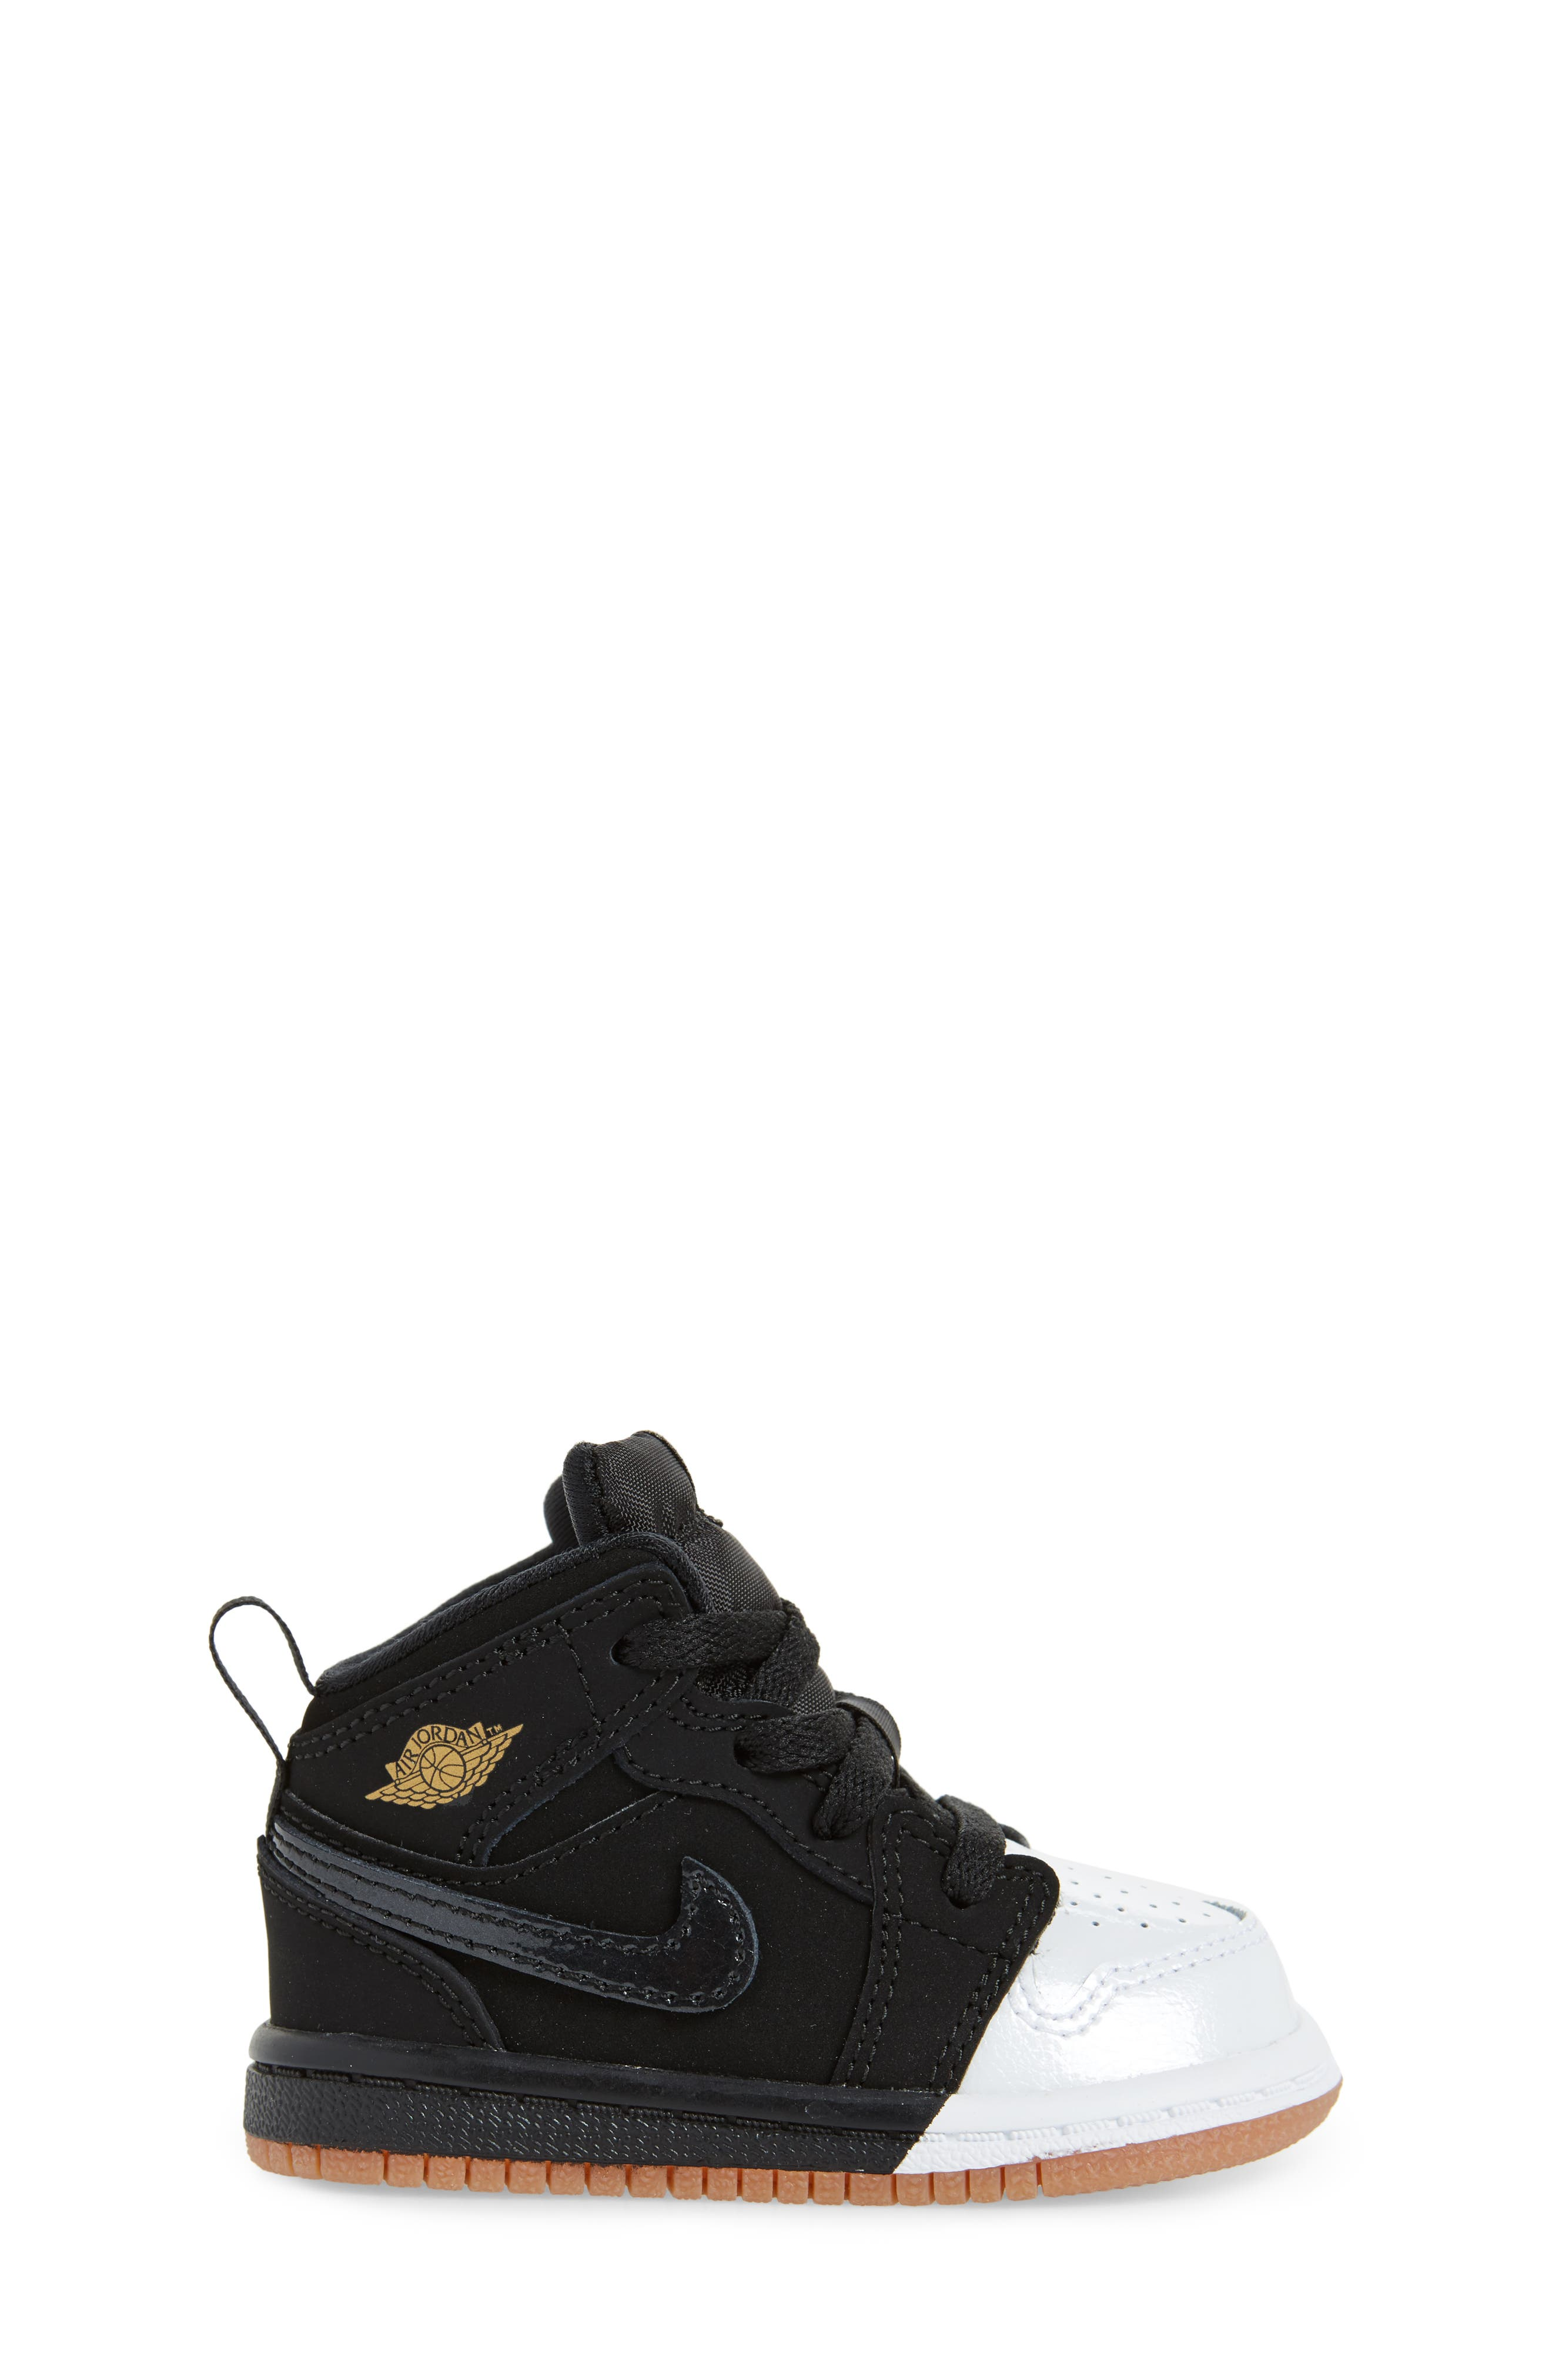 Alternate Image 3  - Nike 'Jordan 1 Mid' Basketball Shoe (Walker)